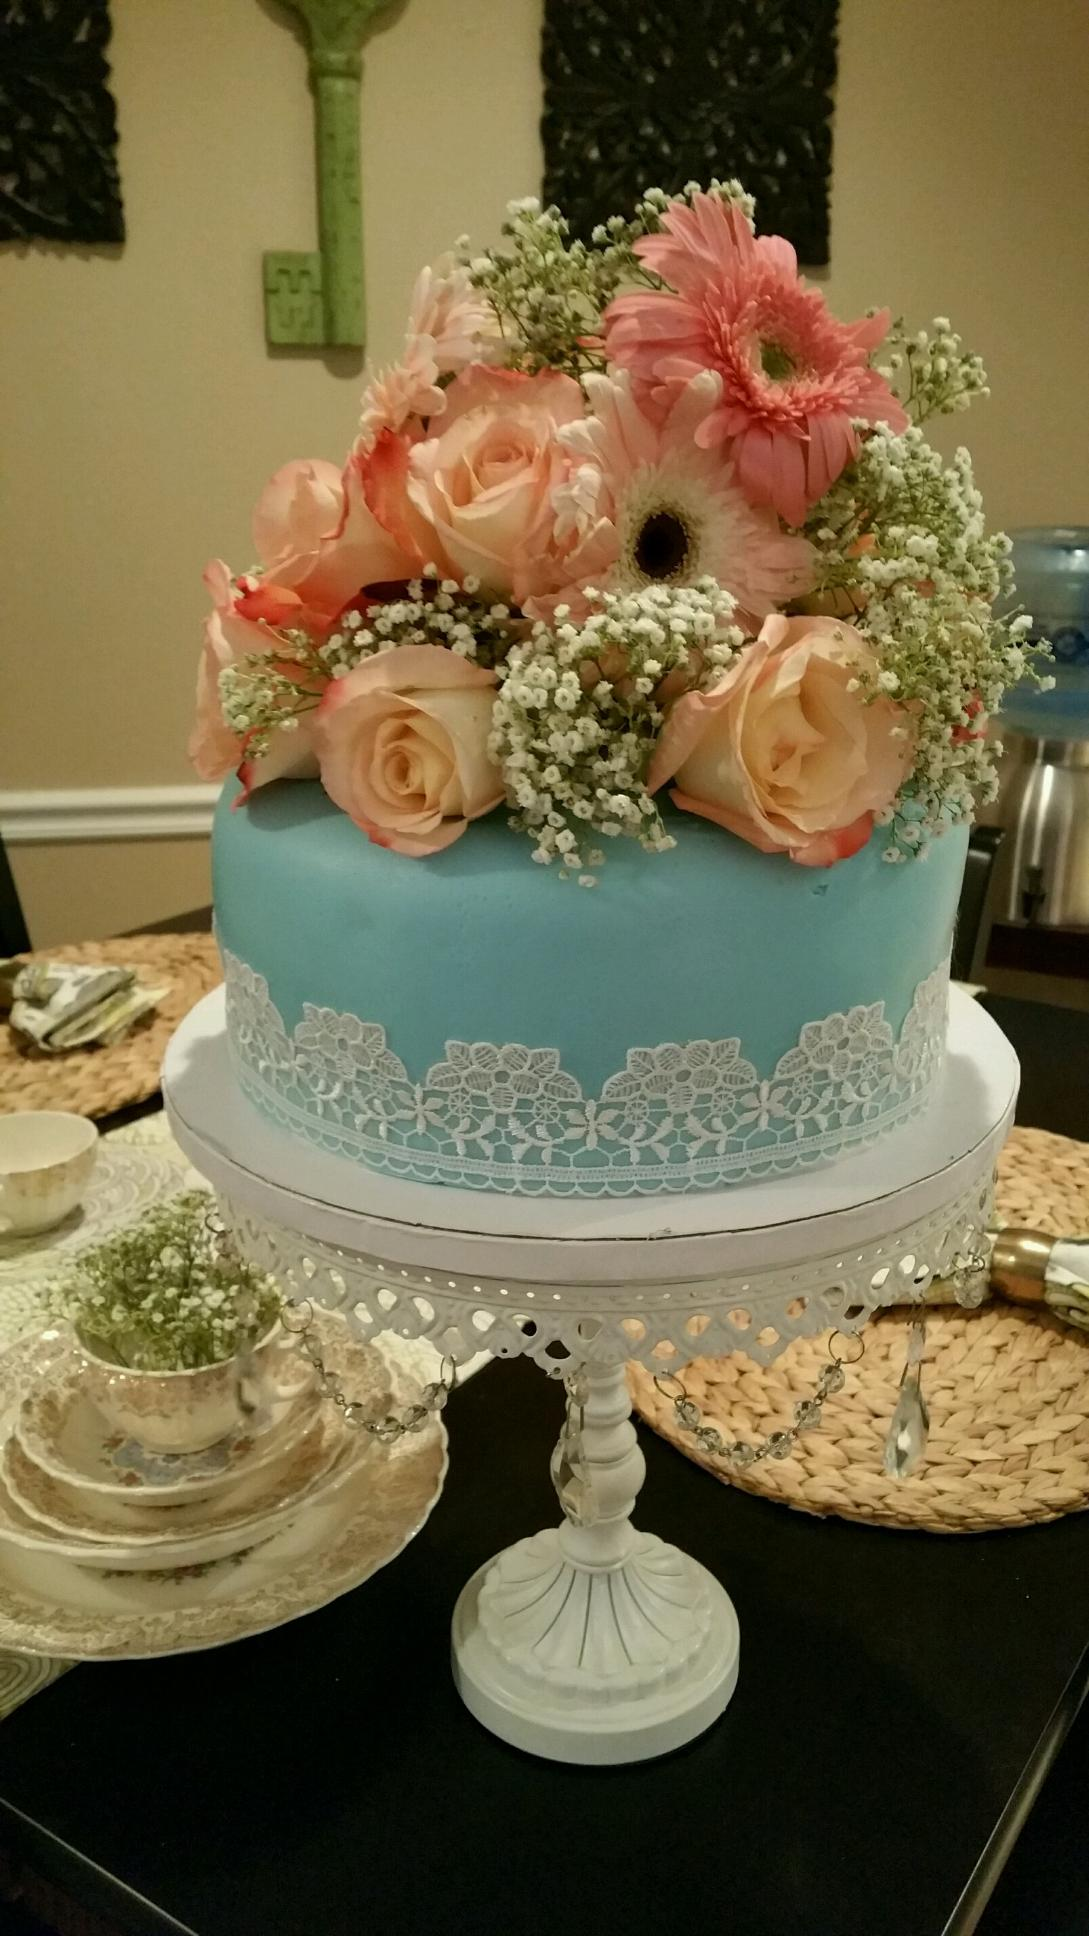 Vintage lace & Flowers Cake